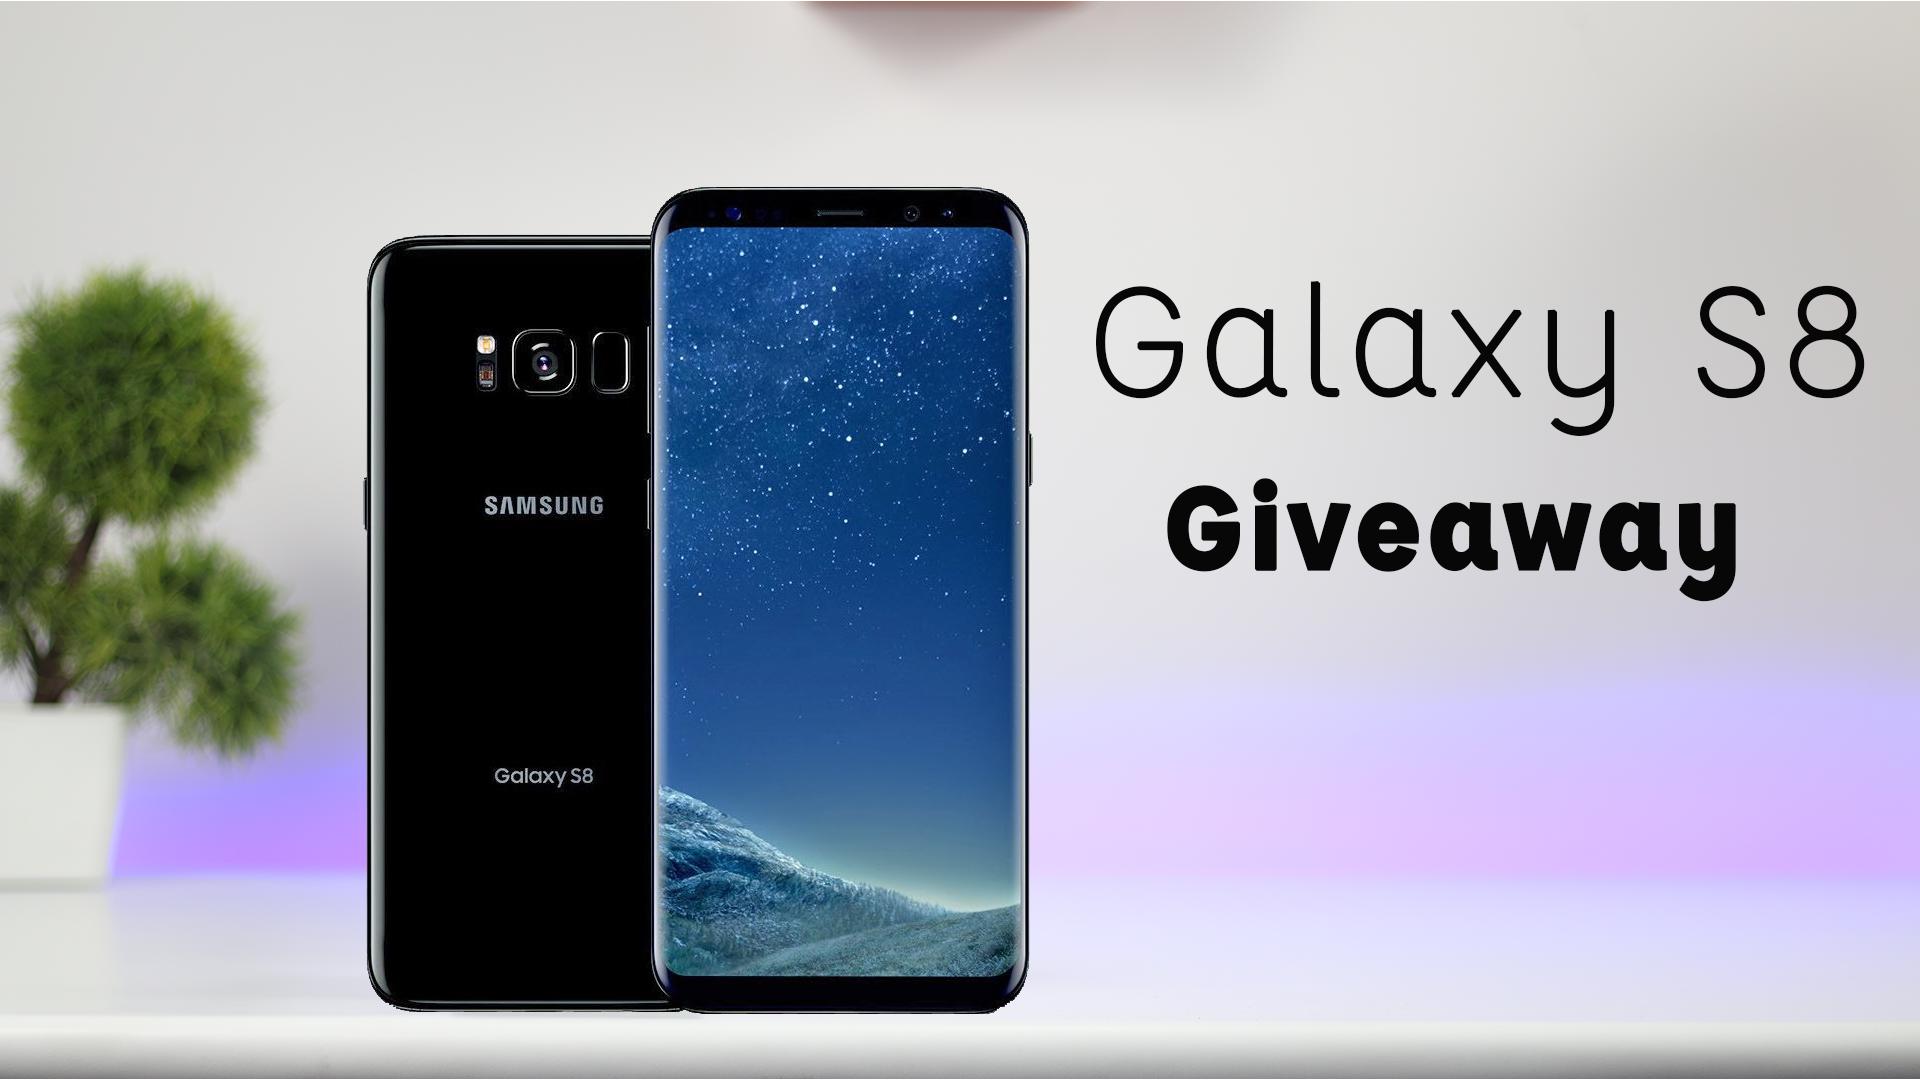 Samsung Galaxy S8 Mega Giveaway